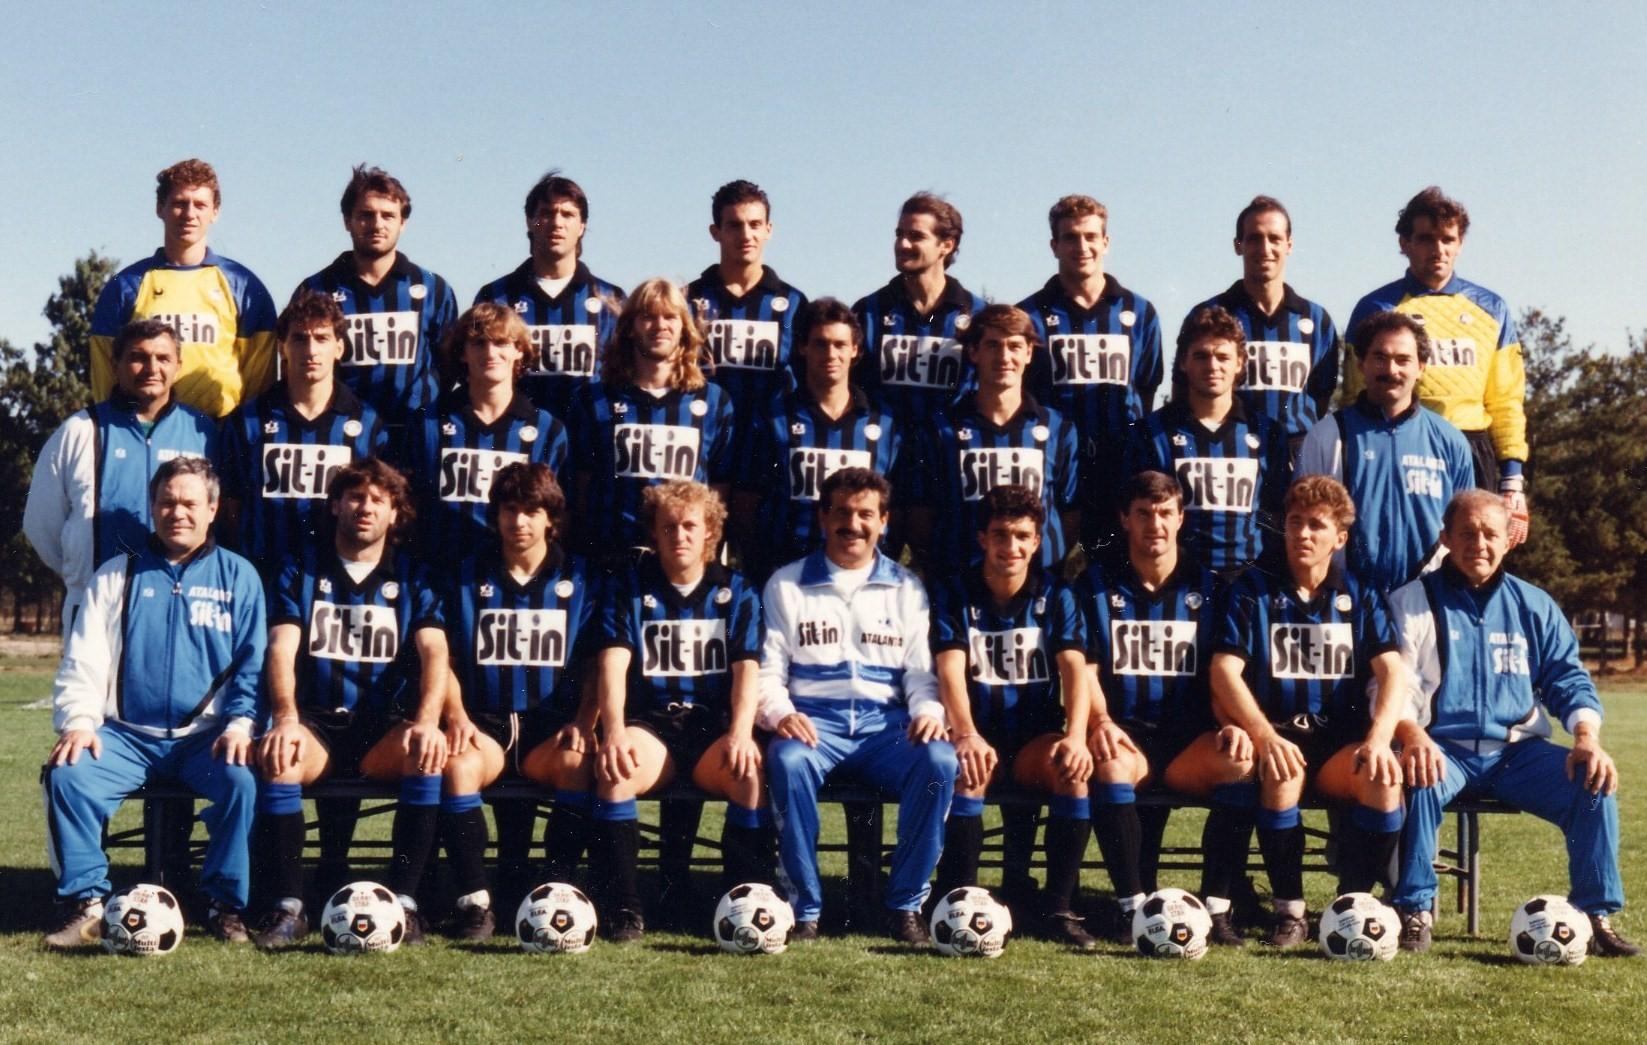 Atalanta 0 vs 2 Lazio - Finale Coppa Italia - 15.05.19 ...  |Atalanta